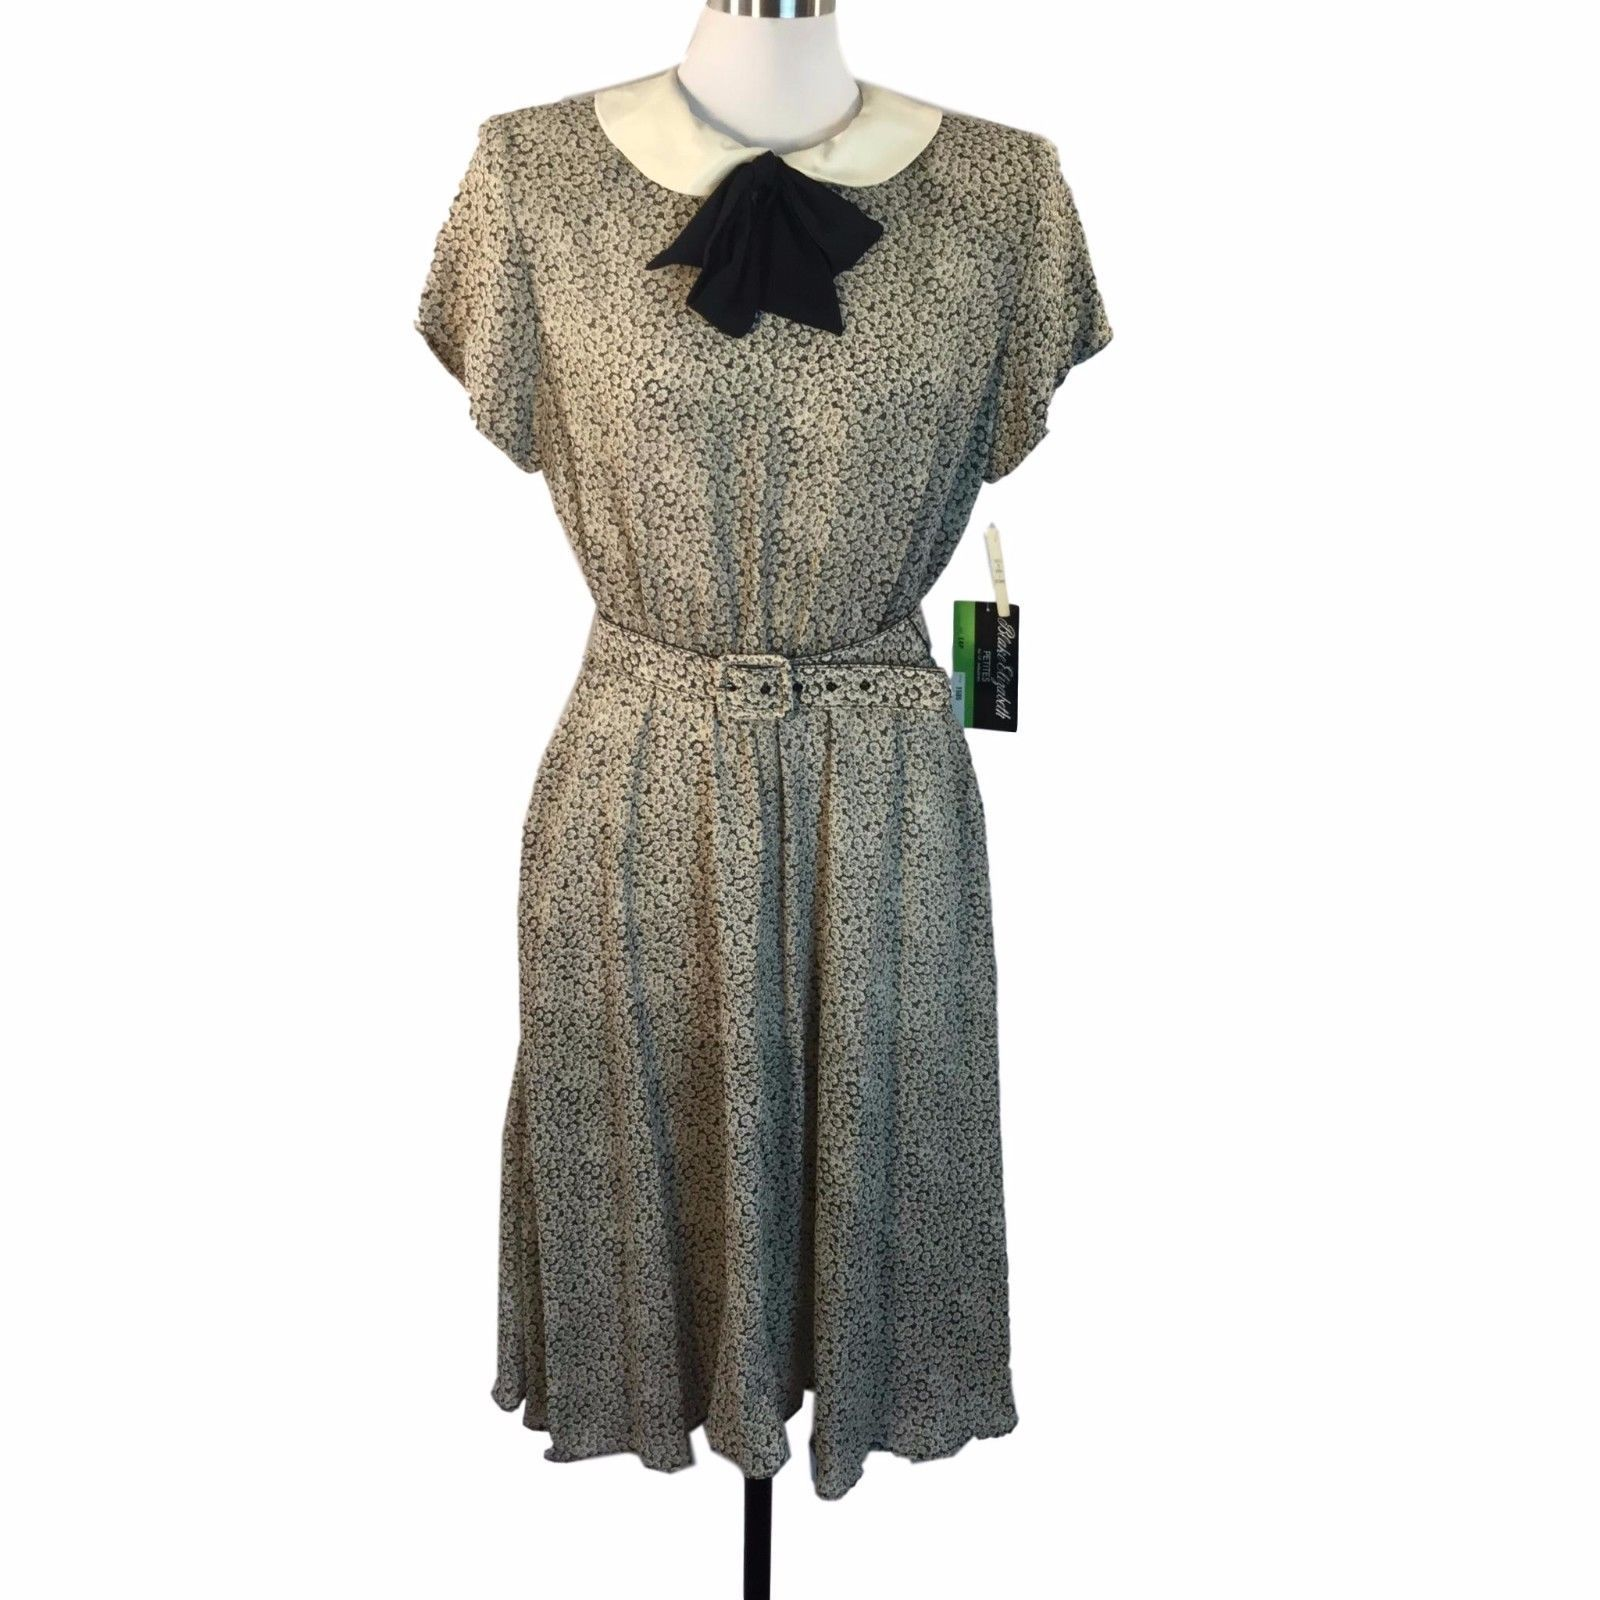 Vtg Fem Black White Floral Peter Pan Collar Dress Wed Adams Goth Office 14P